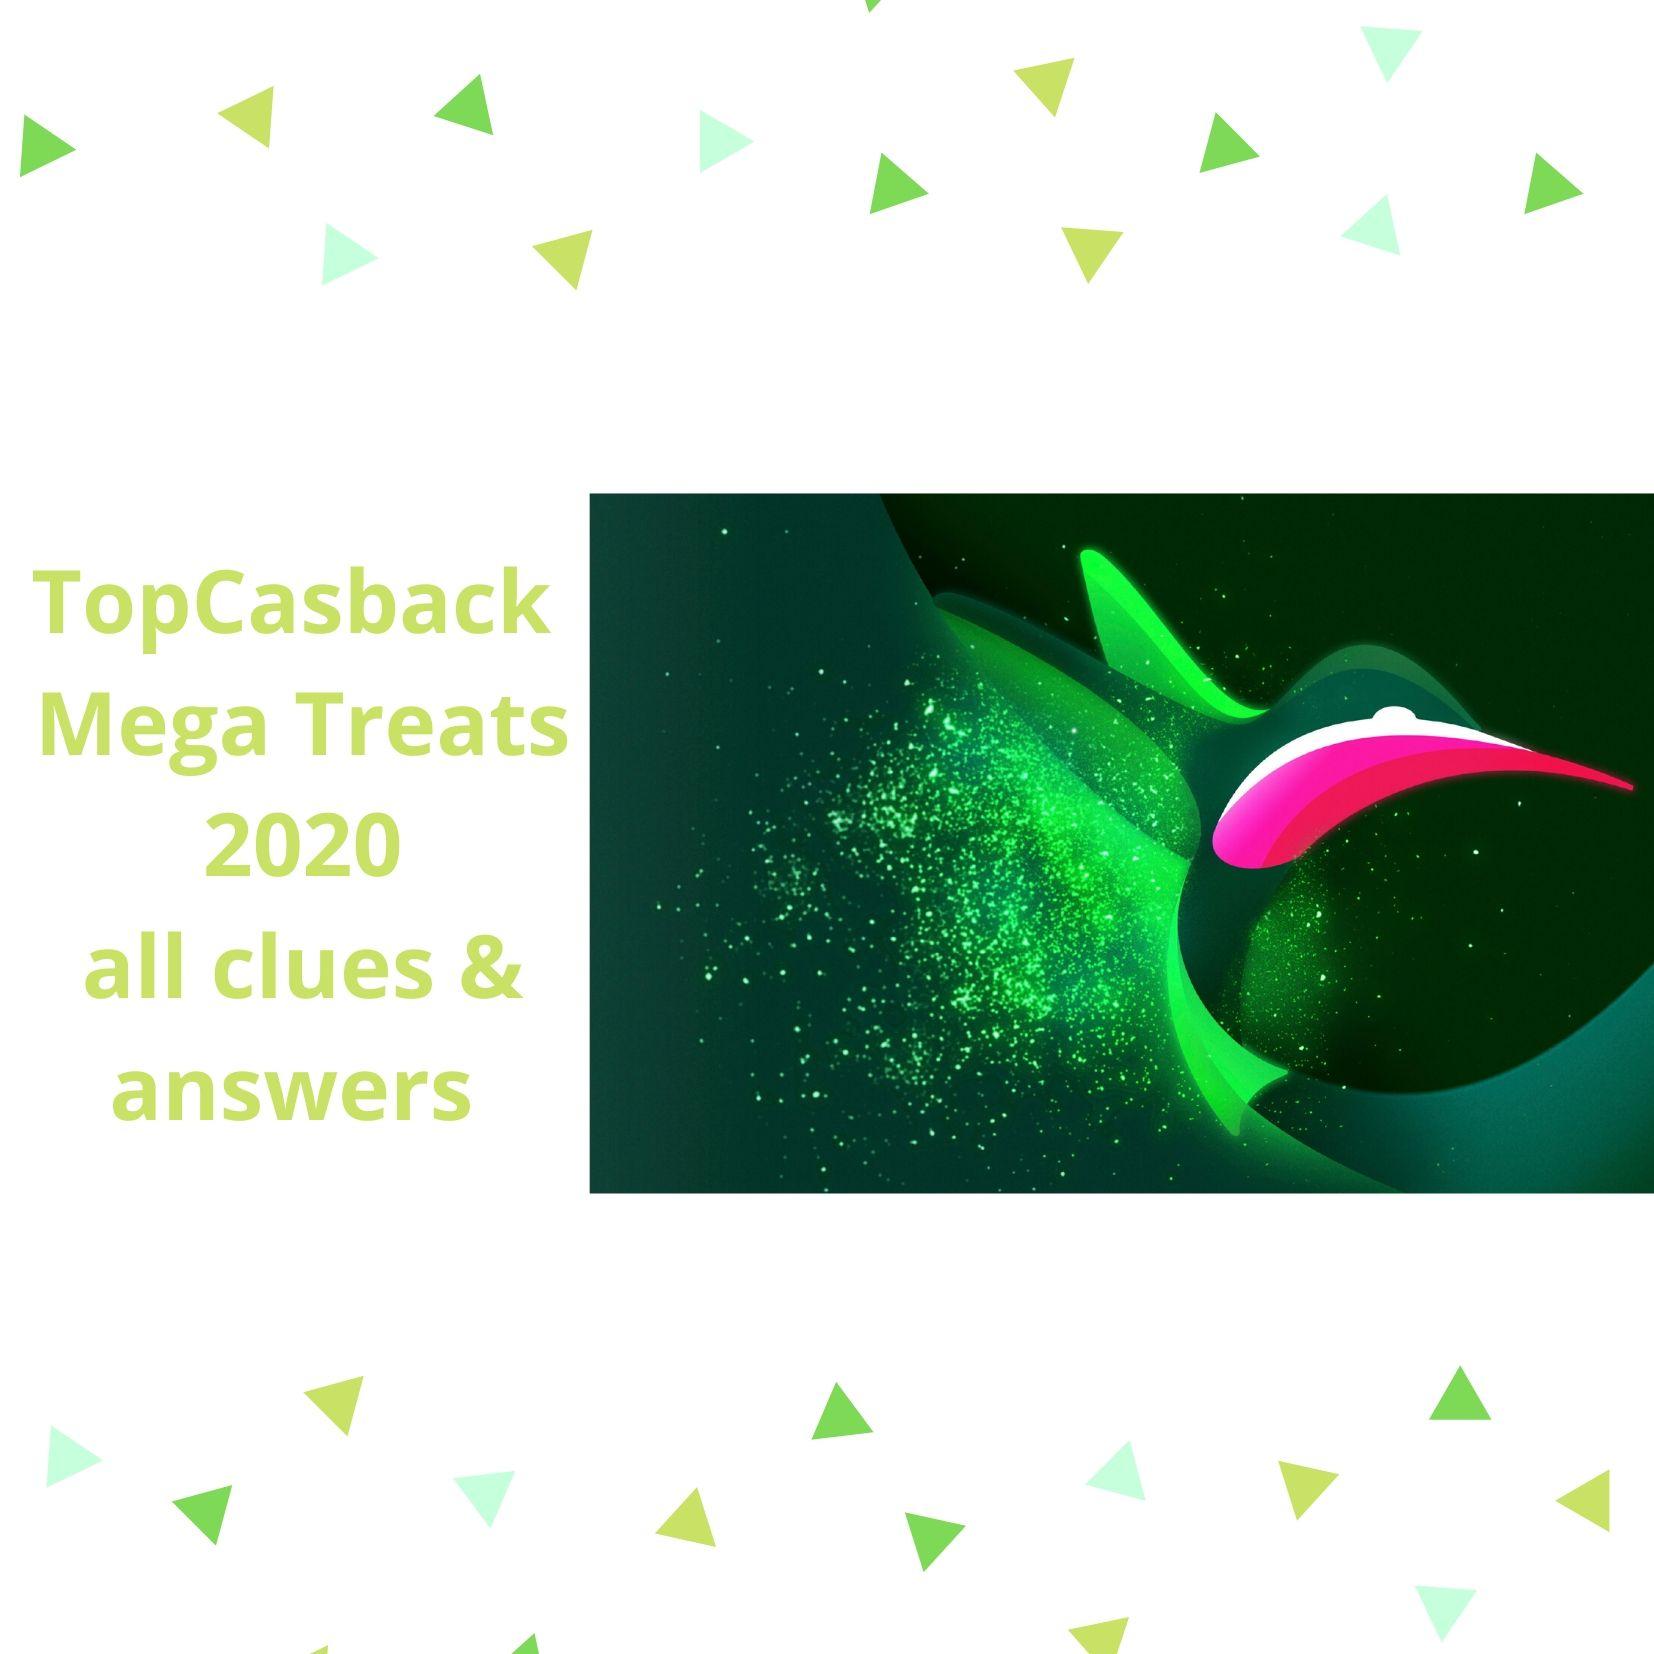 TopCashBack Mega Treats 2020